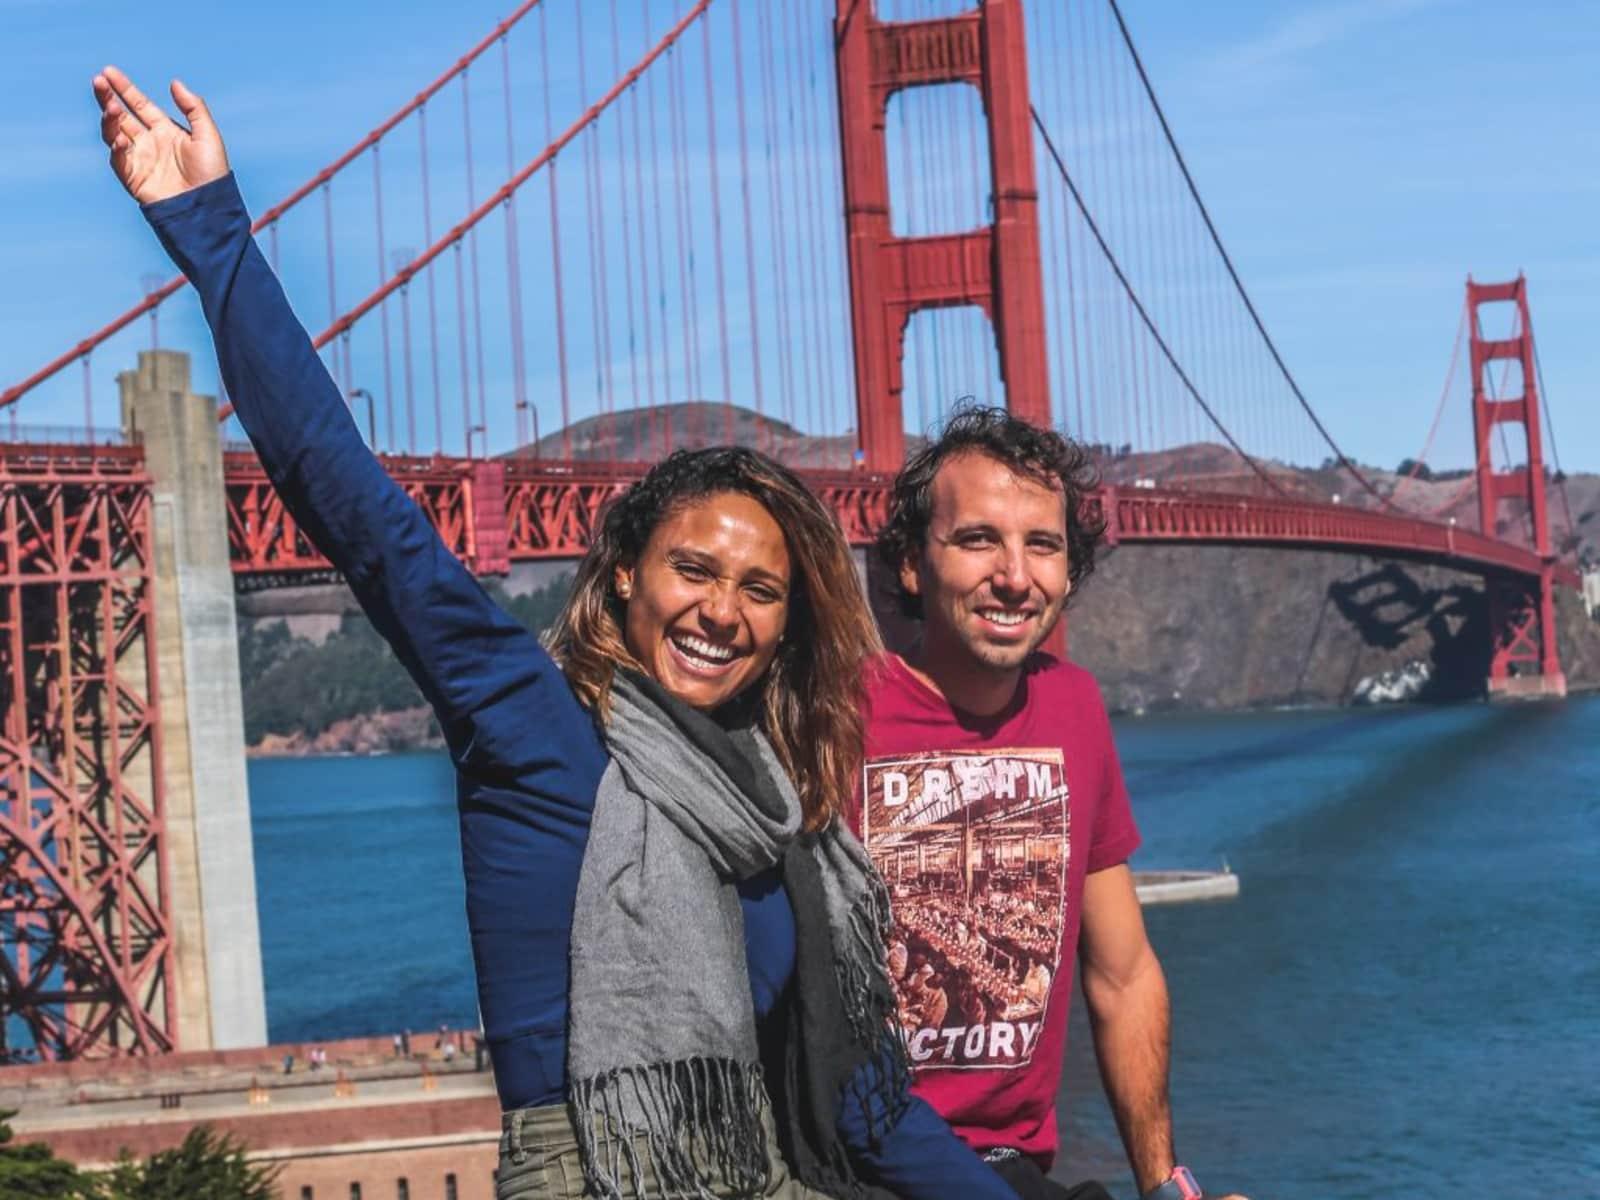 Bruna & Filipe from São Paulo, Brazil